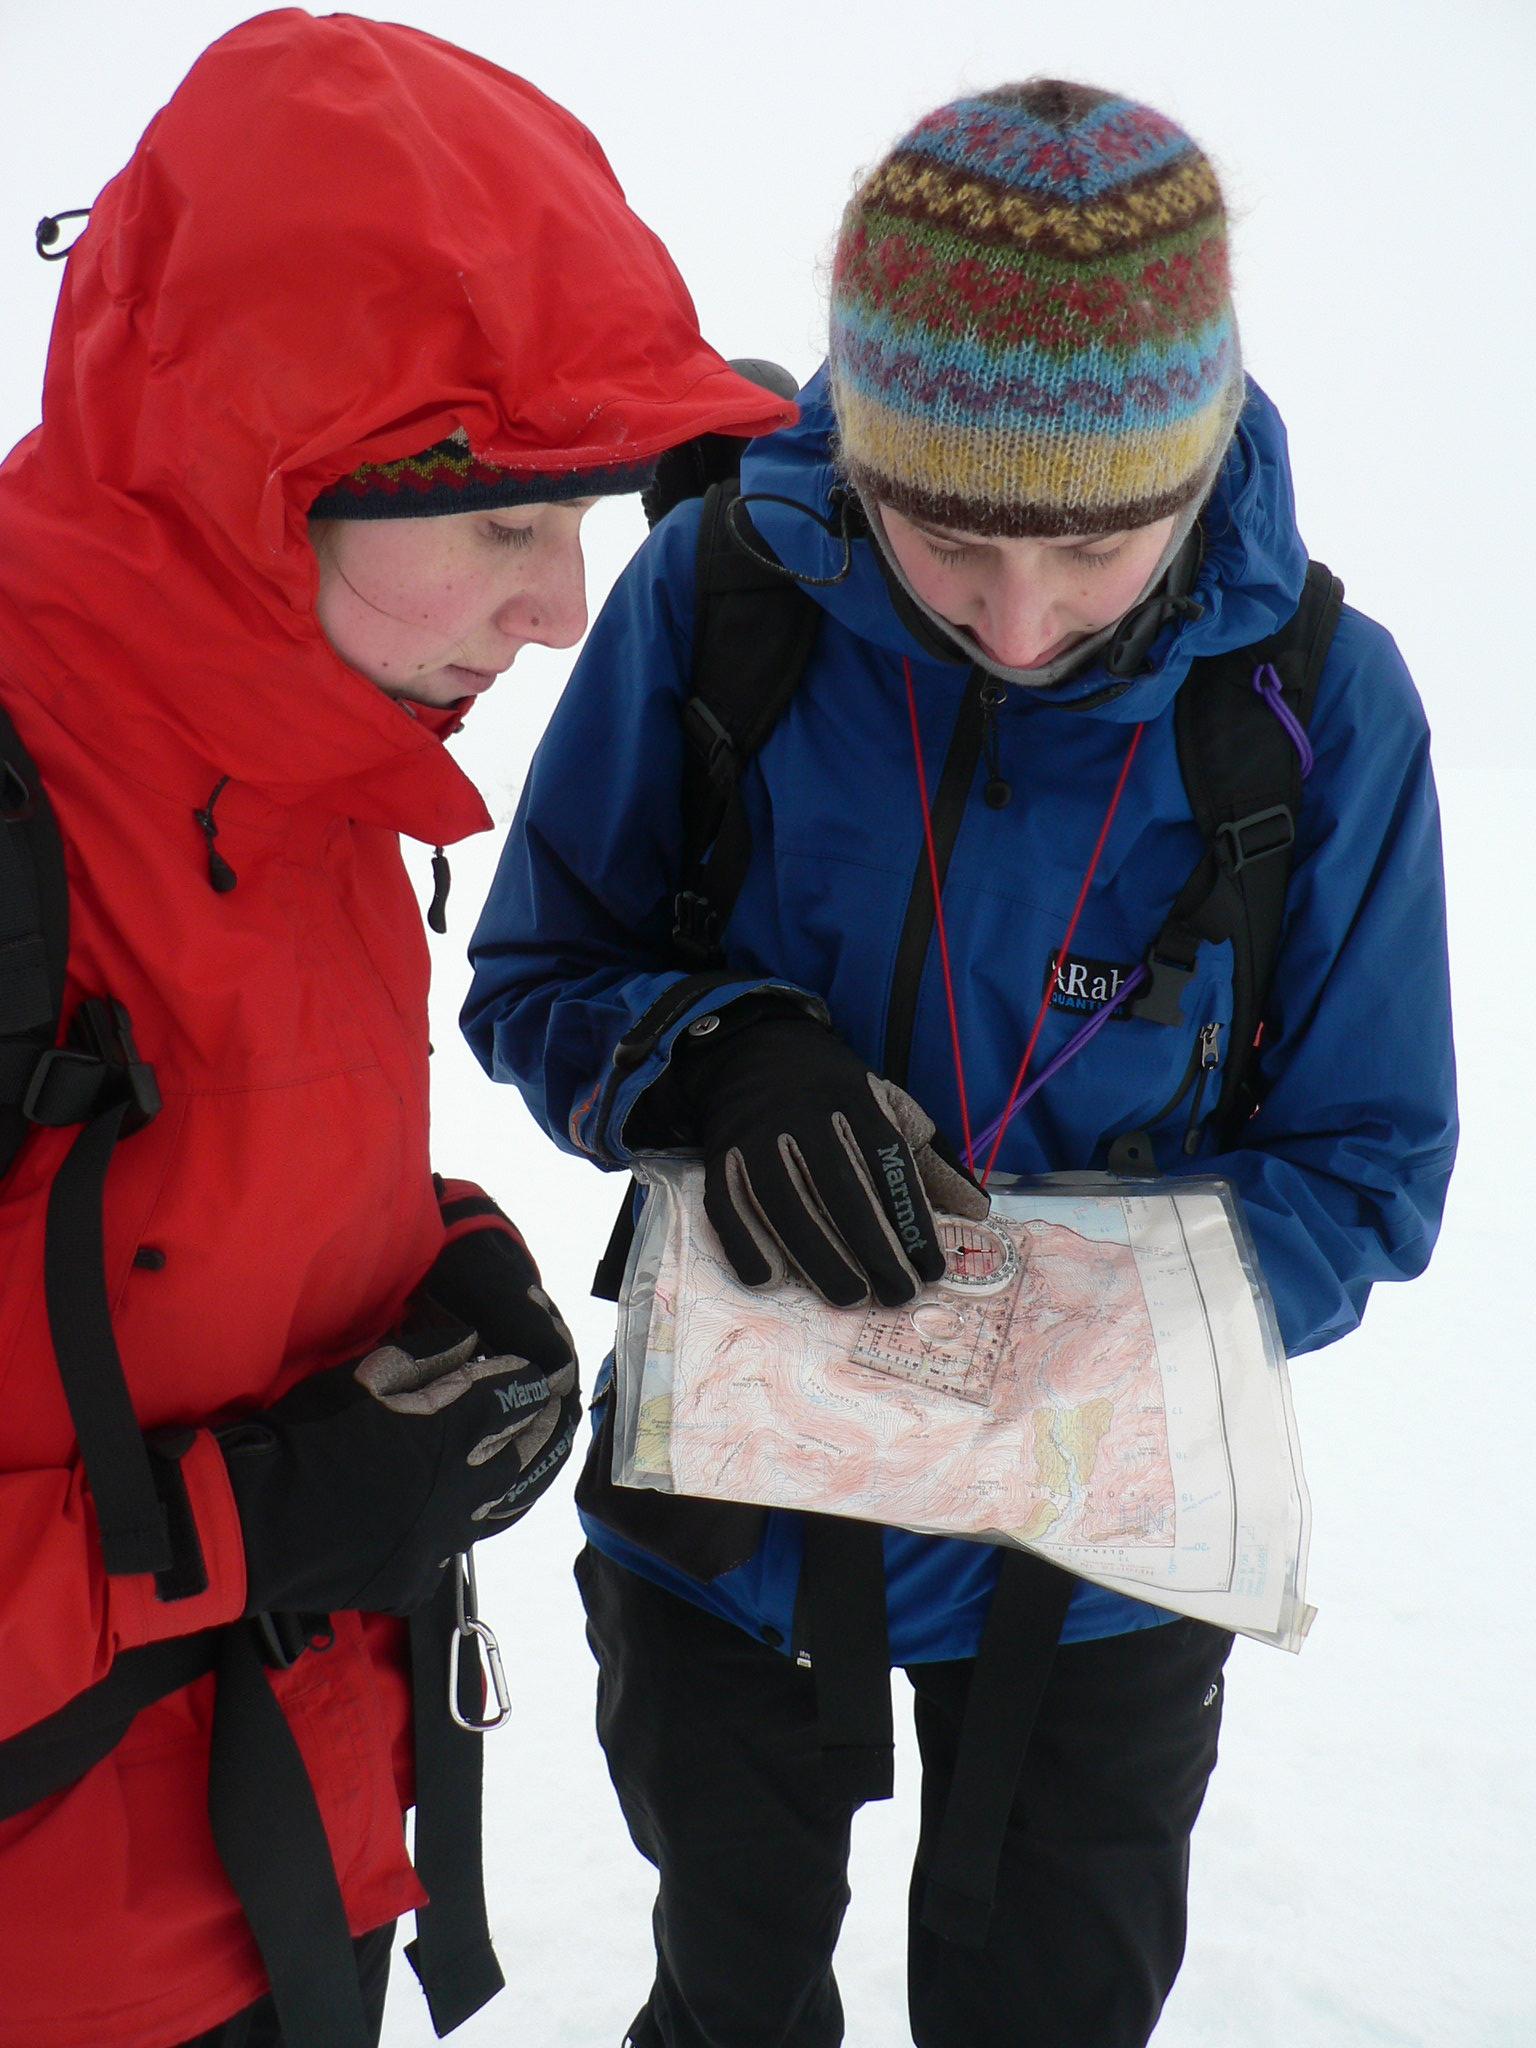 Good time for navigation practice!